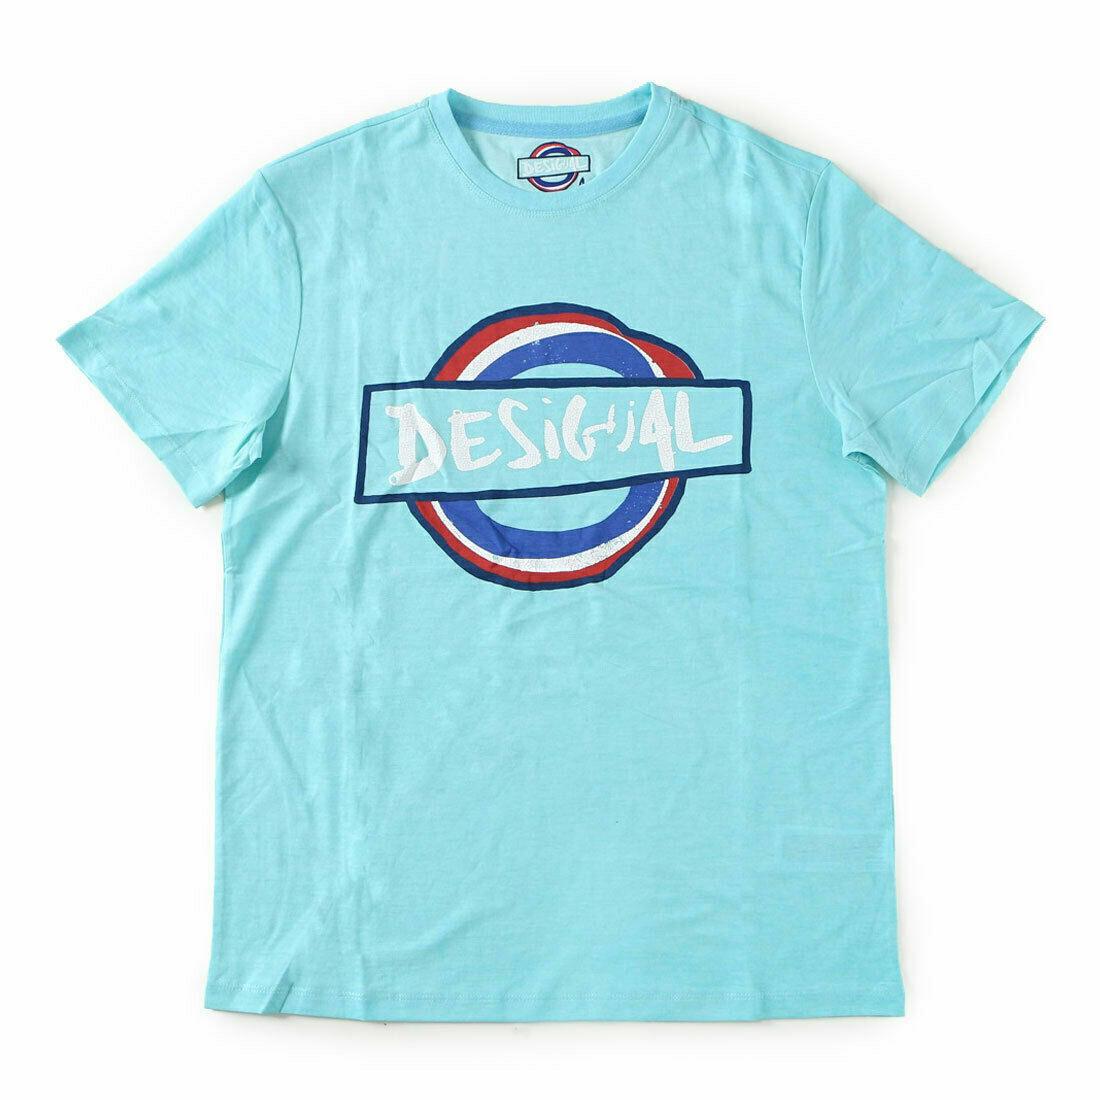 -65% Desigual Men`s T-Shirt TS ELIAS REP Size S NEW 45